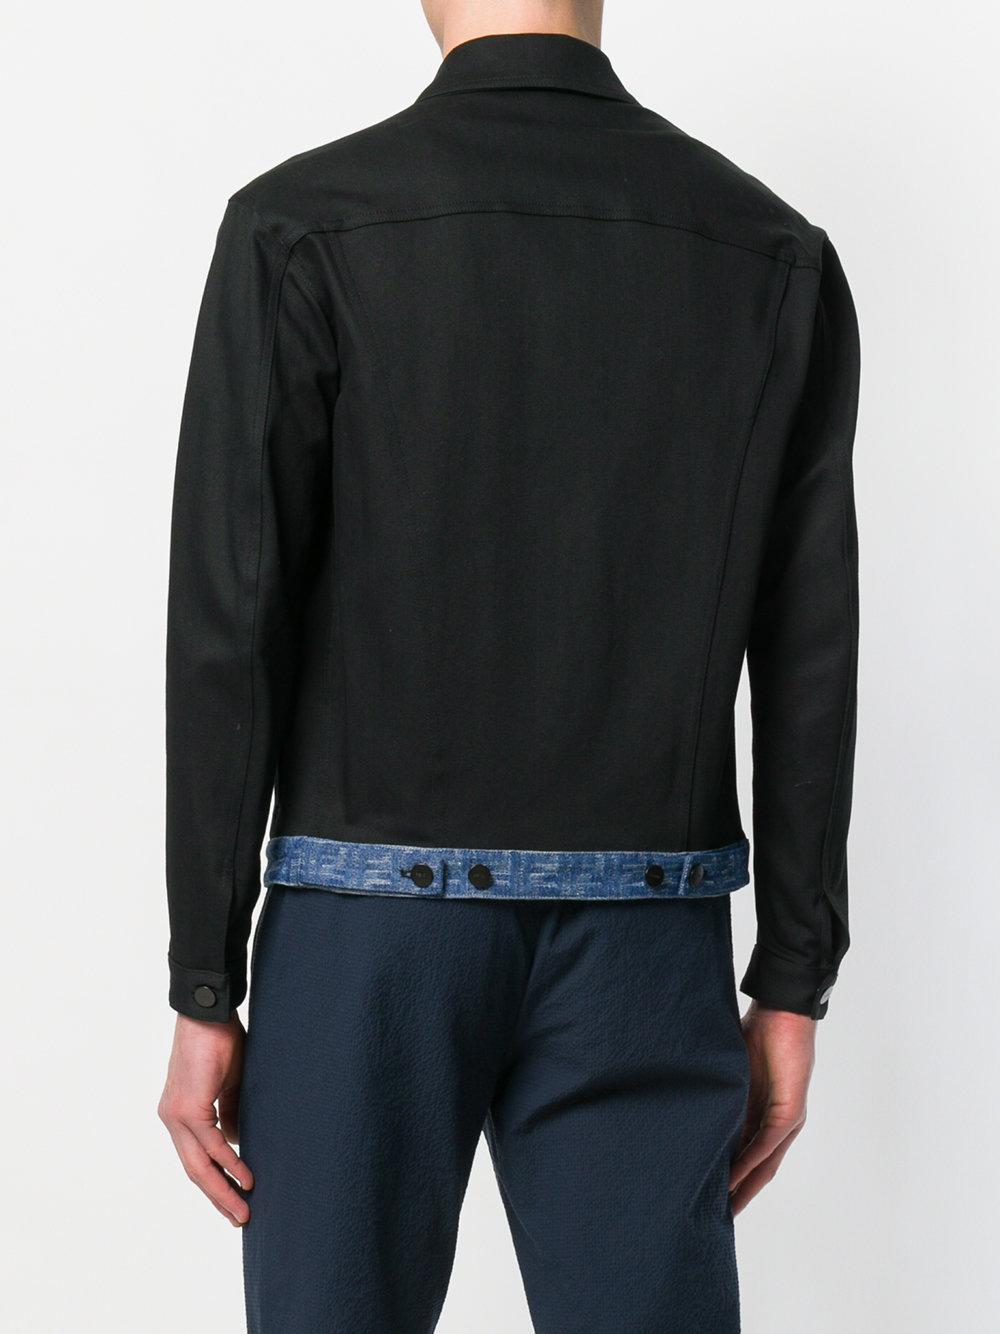 Fendi Ff Logo Denim Jacket in Black for Men